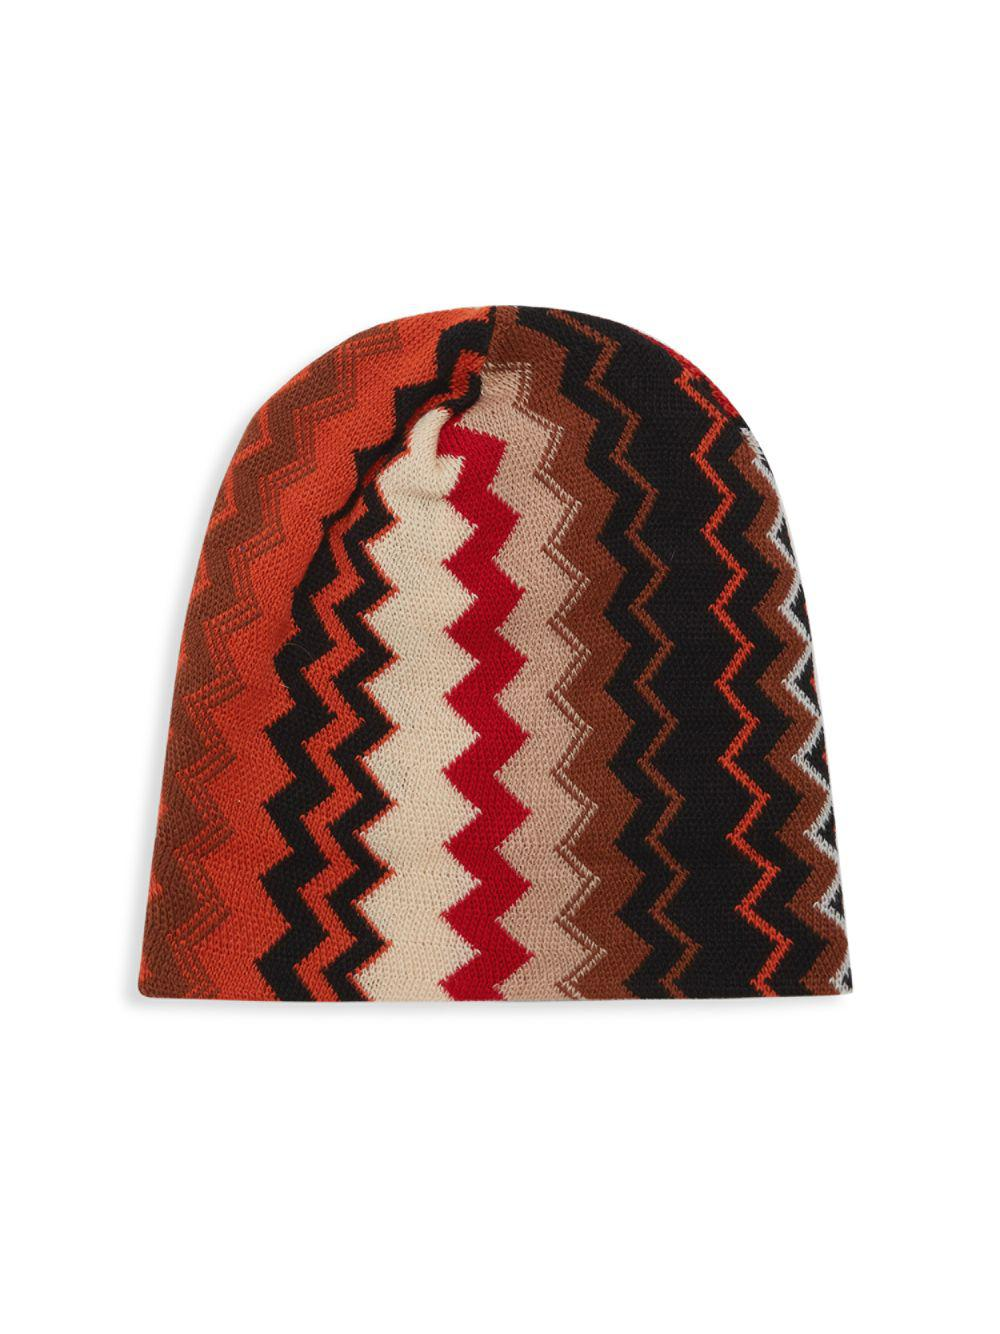 Lyst - Missoni Chevron Knit Beanie in Red for Men cc45cec32cbd